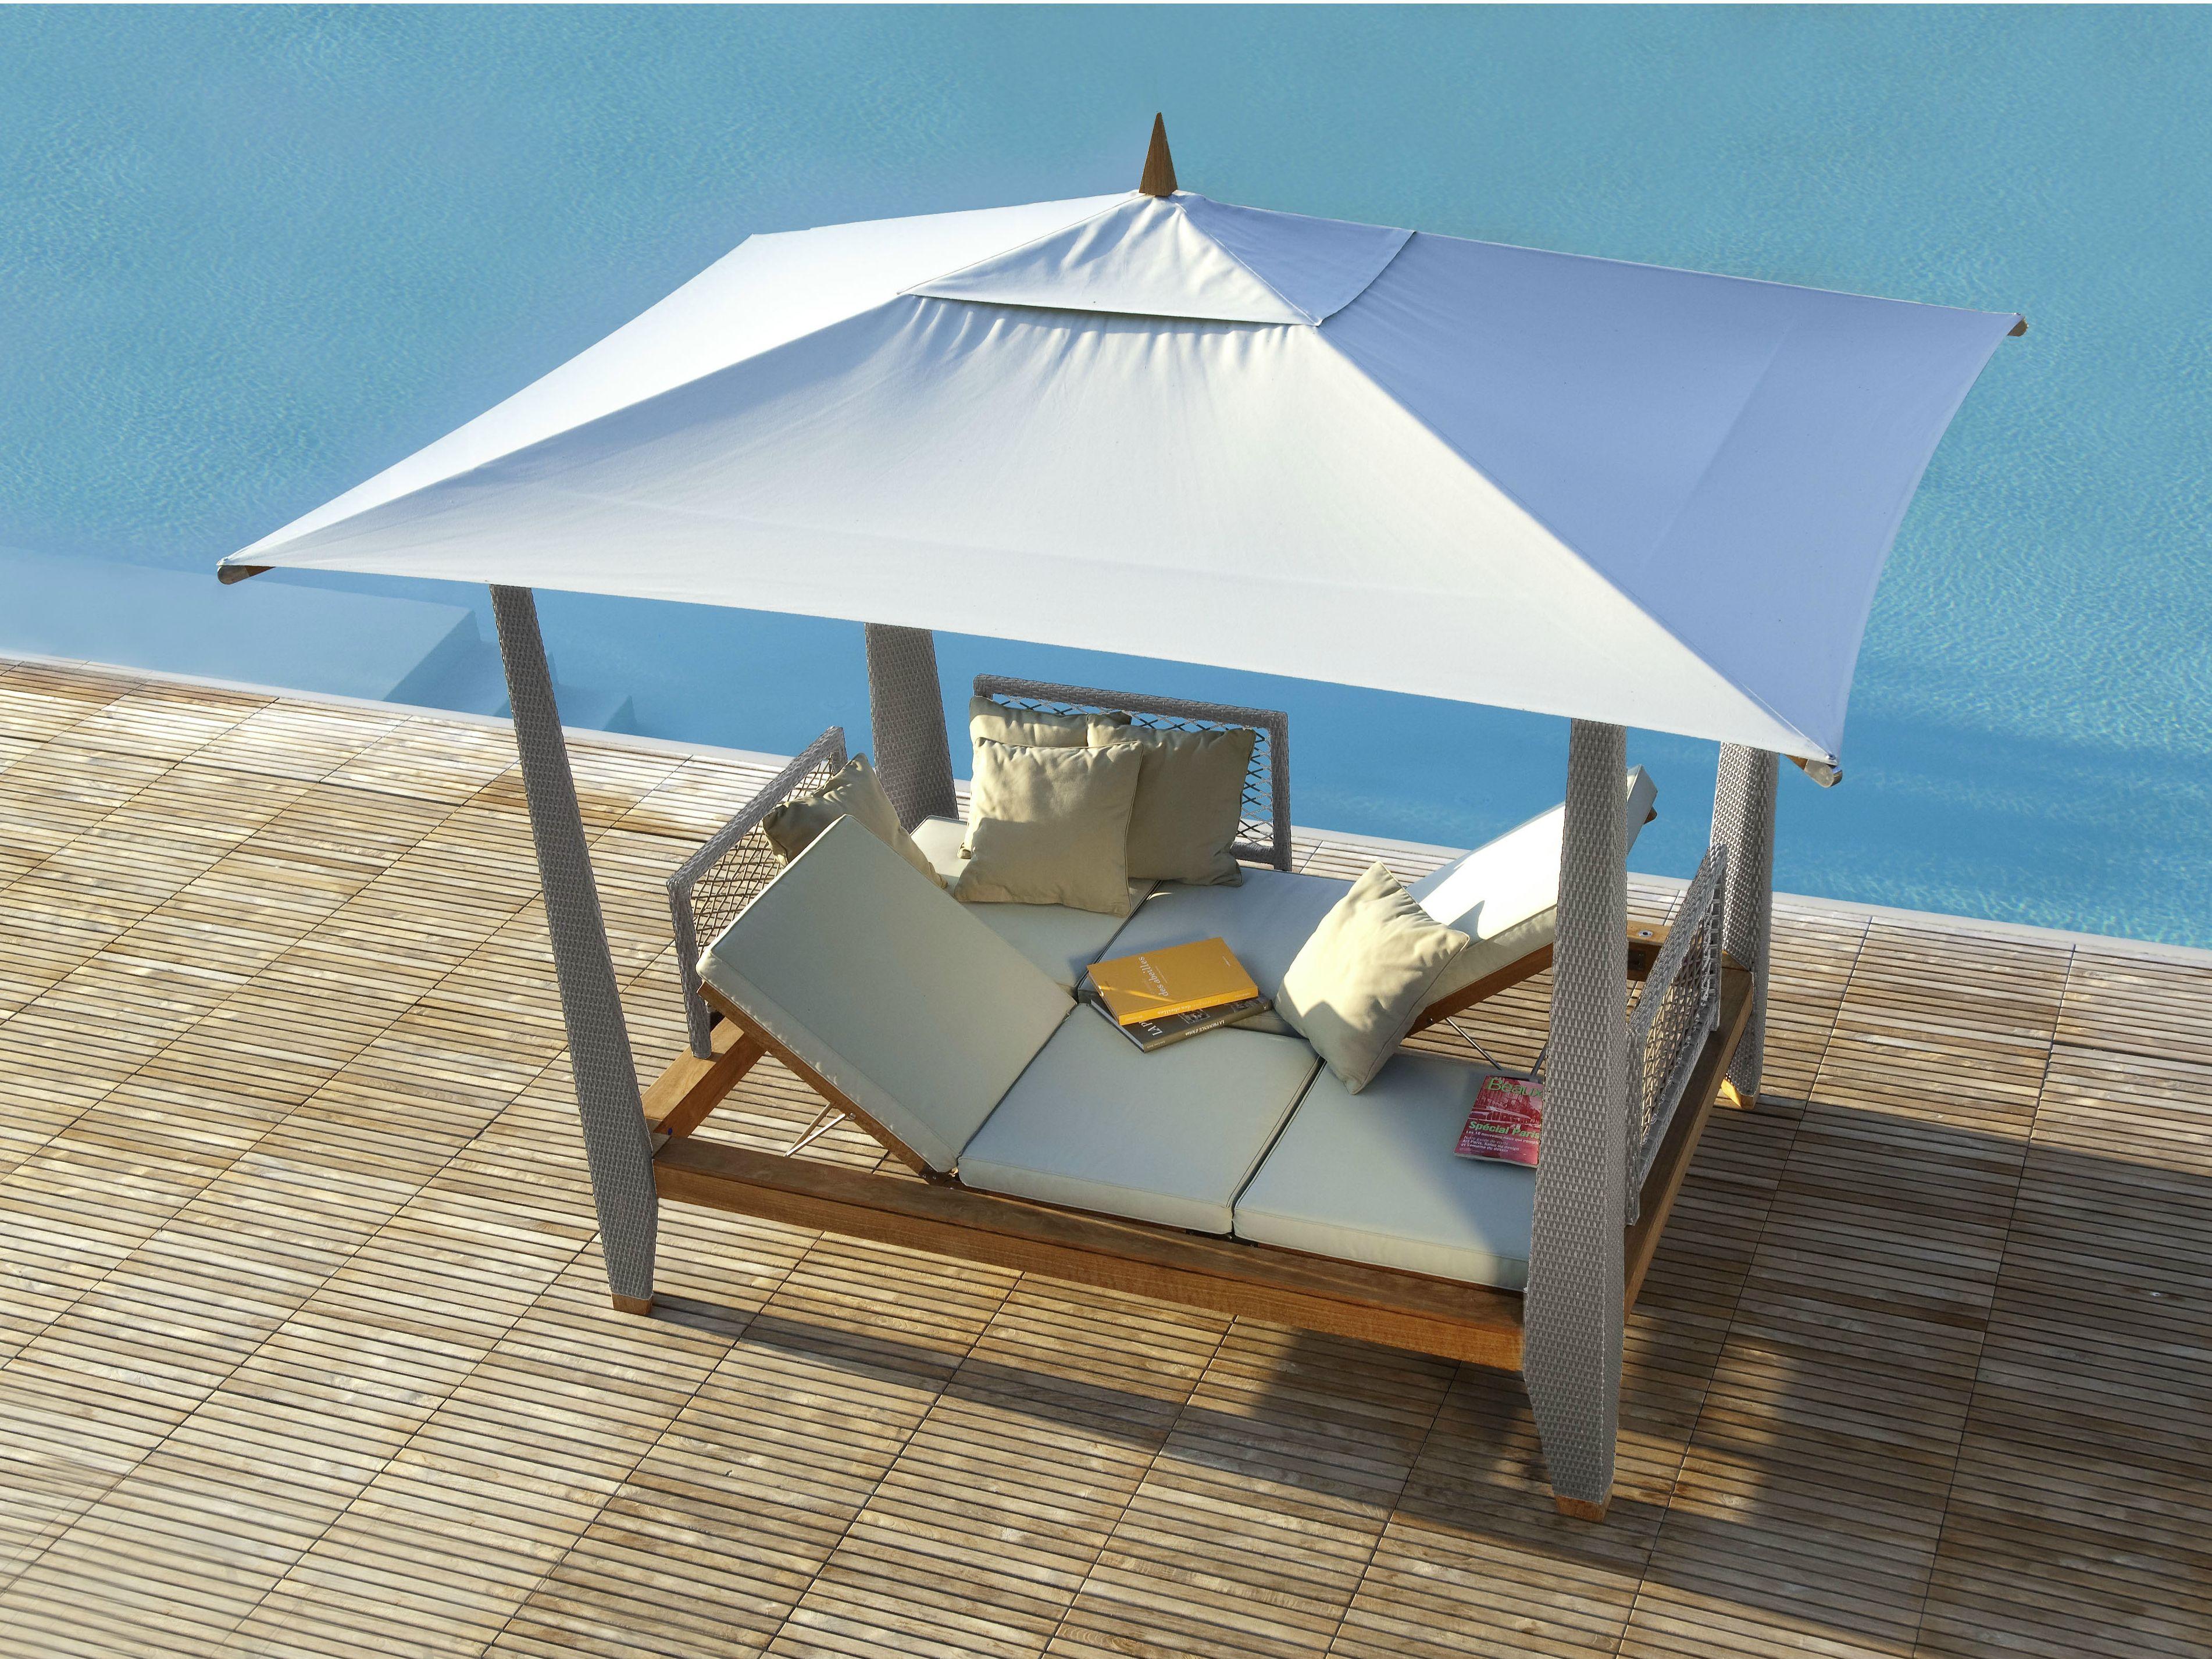 zayo lit de jardin collection zayo by les jardins. Black Bedroom Furniture Sets. Home Design Ideas